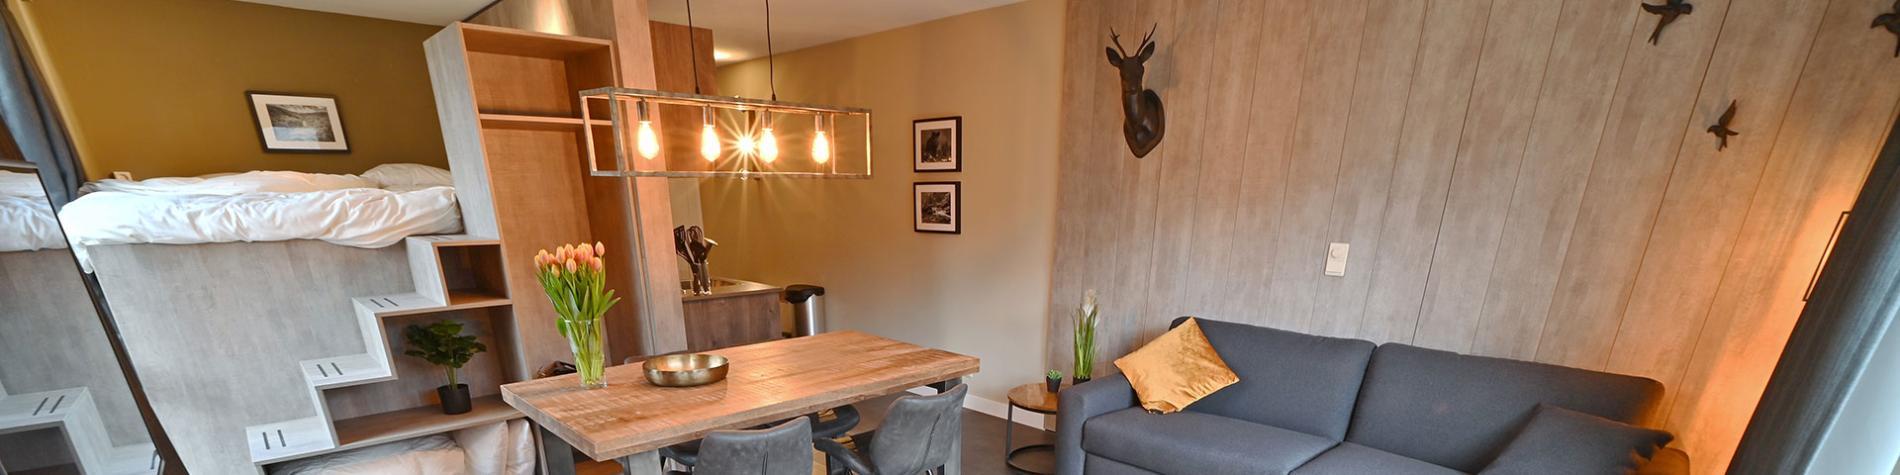 Village de vacances - Résidence Durbuy - 120 villas-appartements de luxe